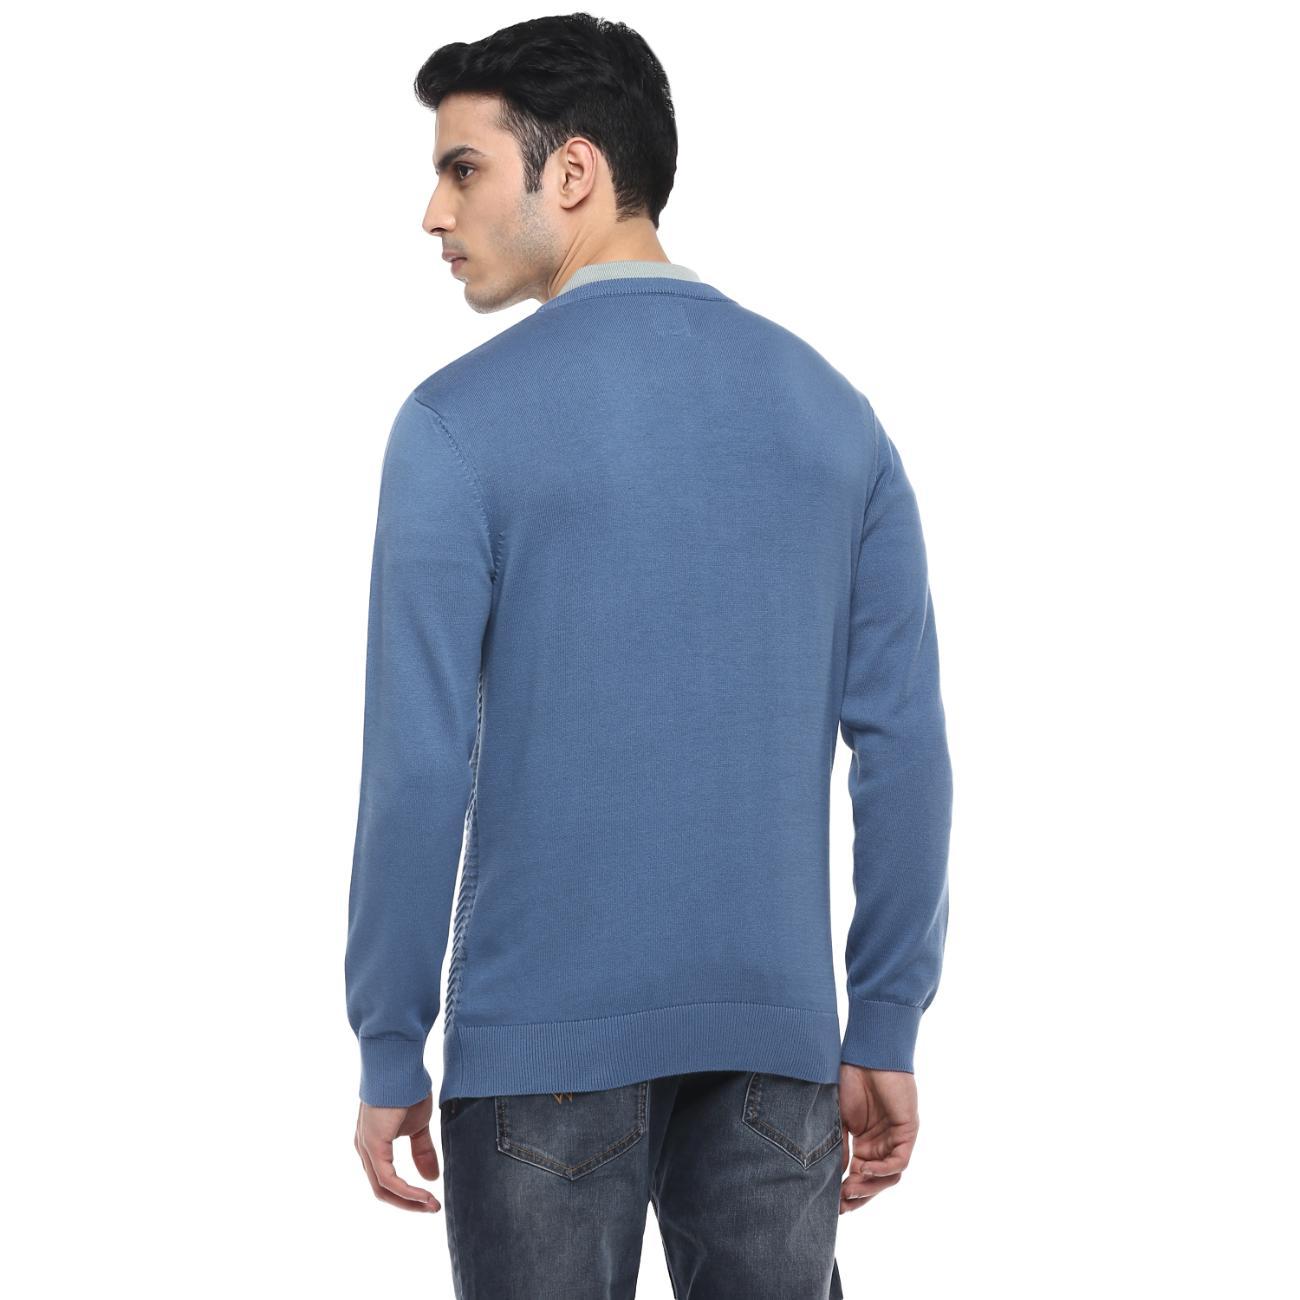 Men's V-neck Blue Casual Sweater Online